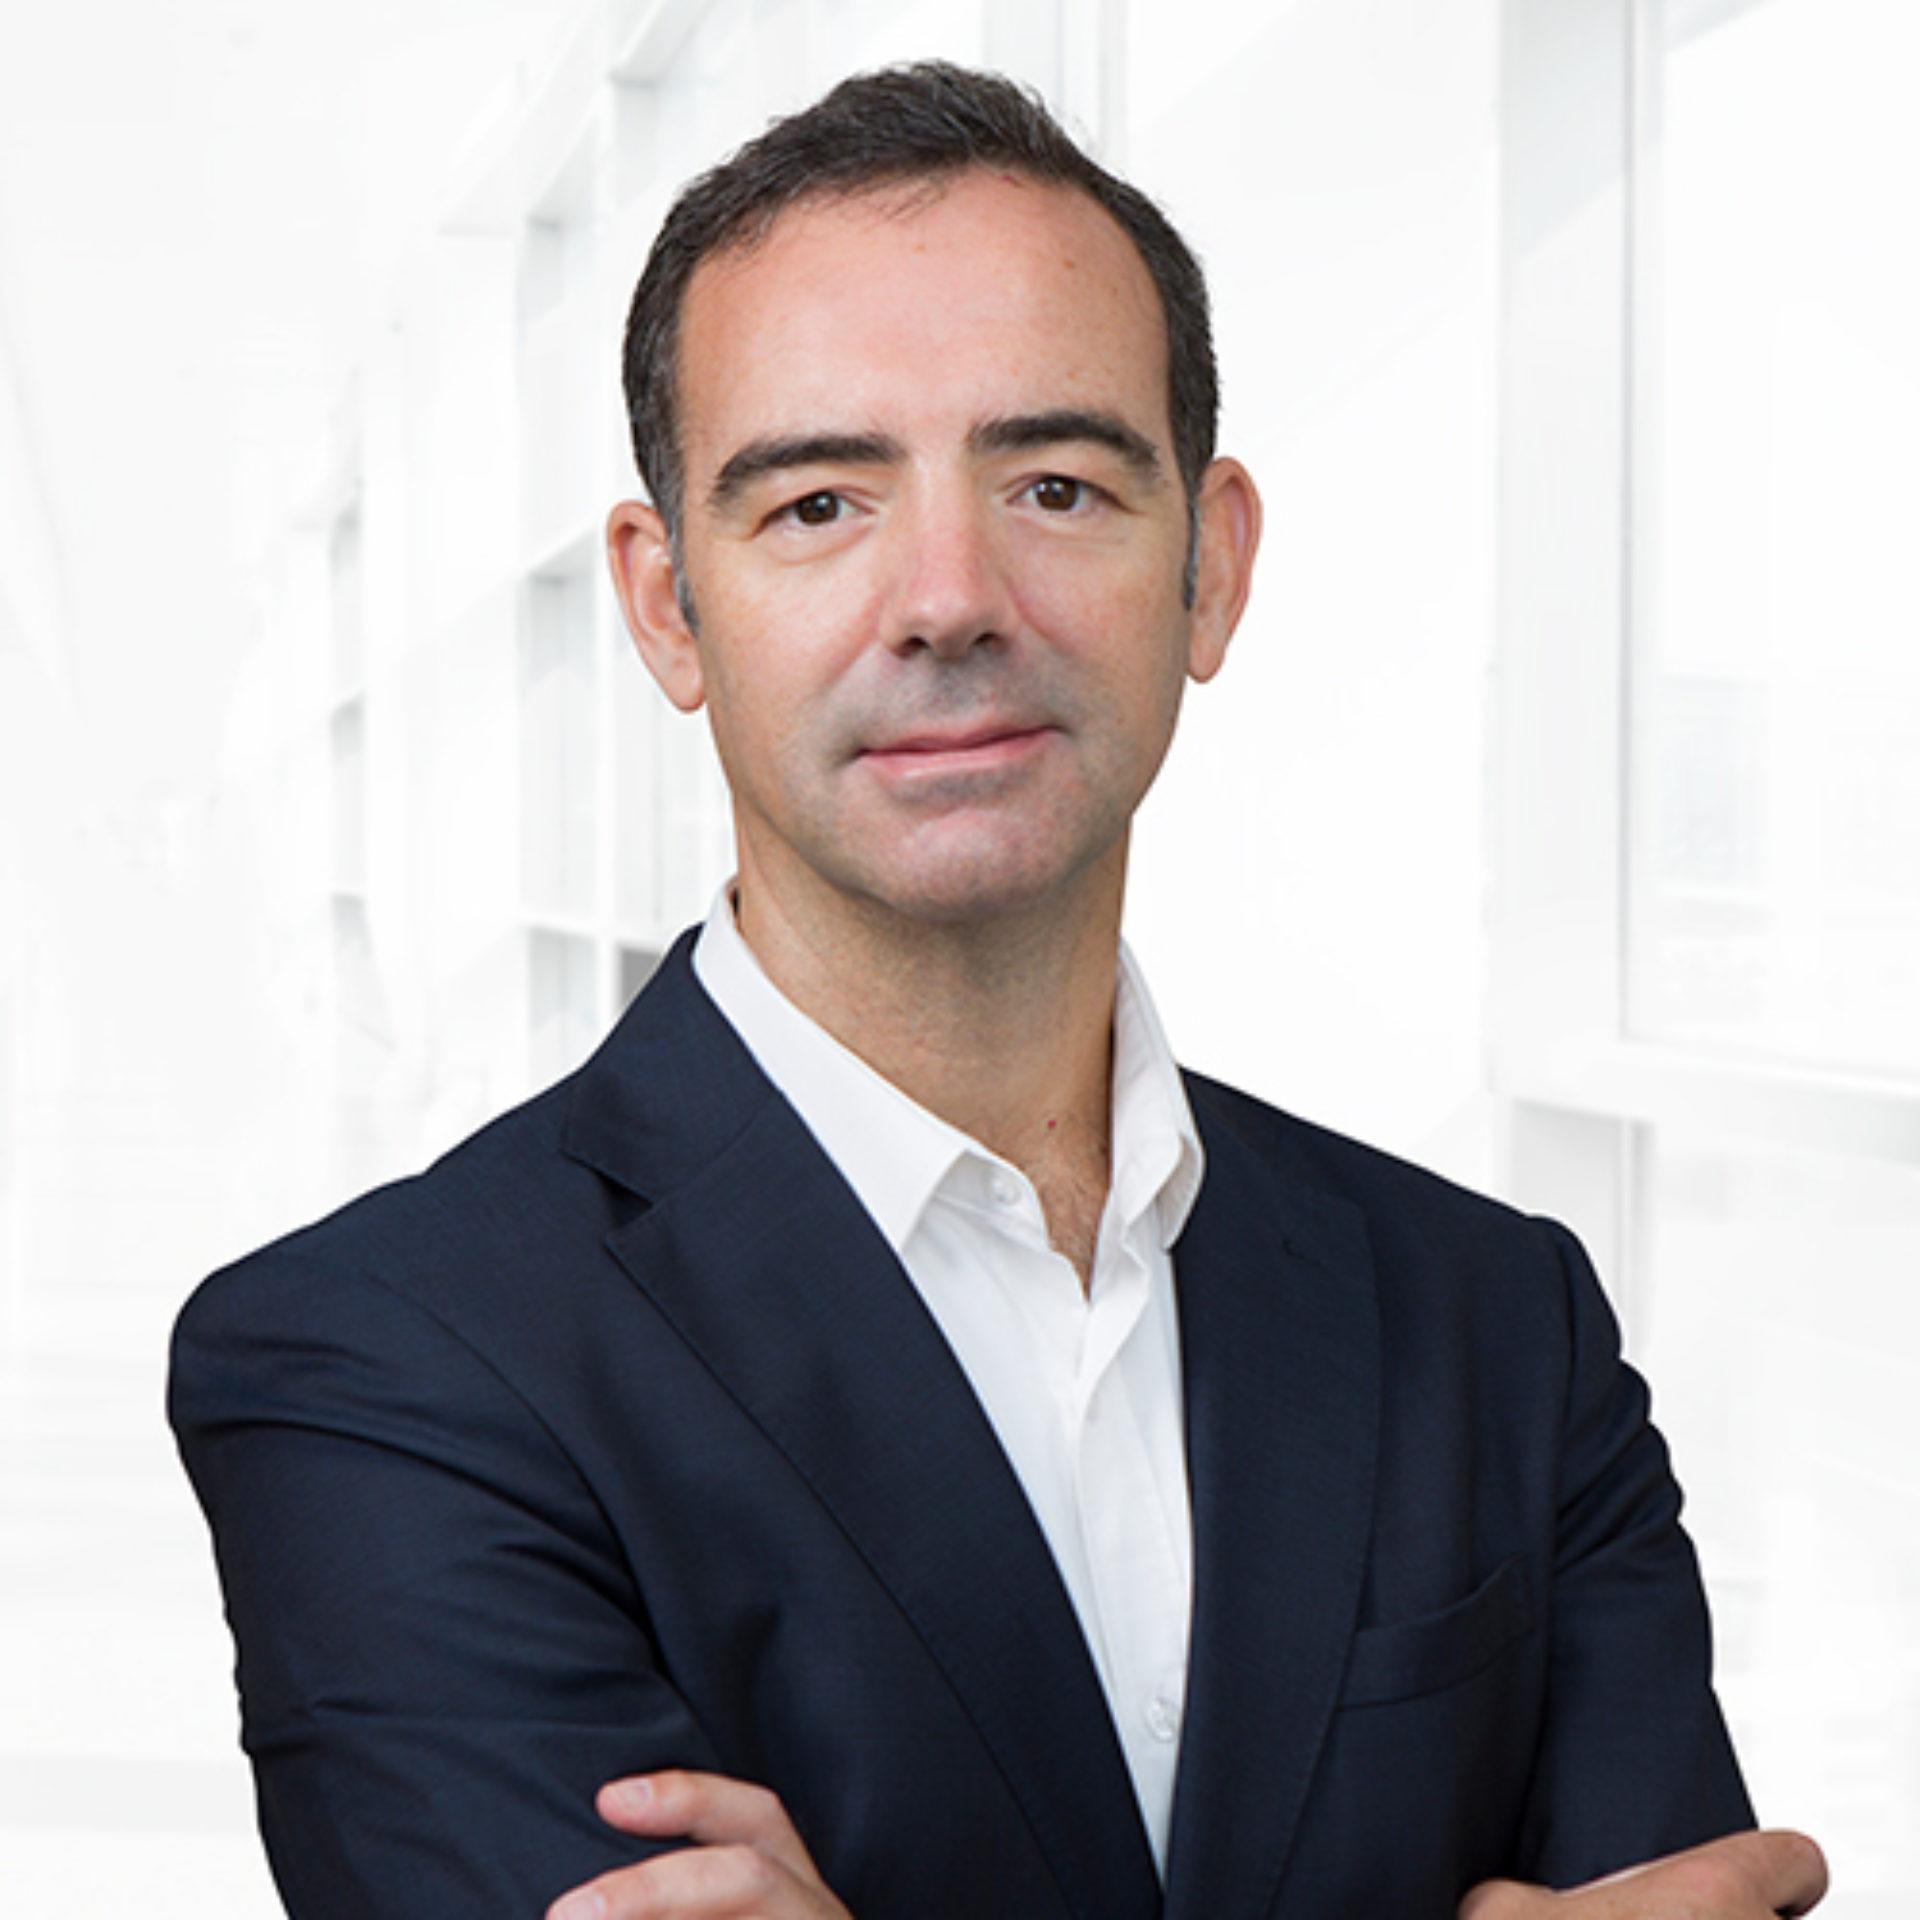 Photo of Miguel Ángel Lorenzo